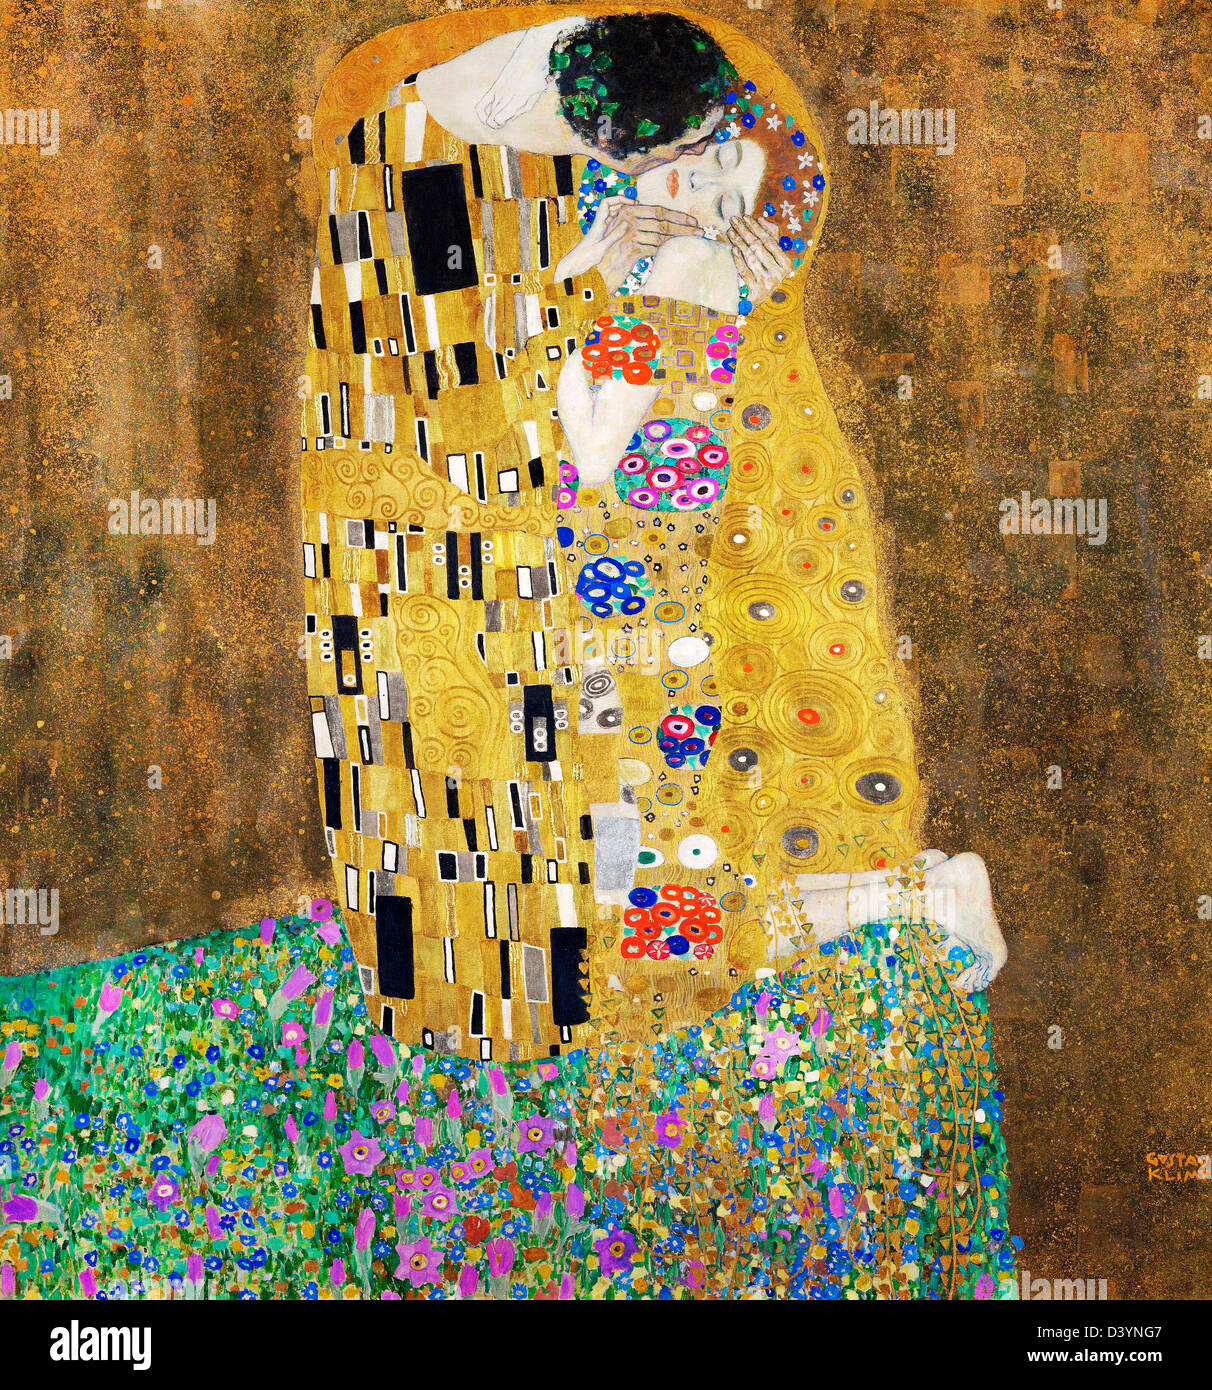 Gustav Klimt, The Kiss 1907-1908 Oil on canvas. Austrian Gallery Belvedere, Vienna, Austria - Stock Image